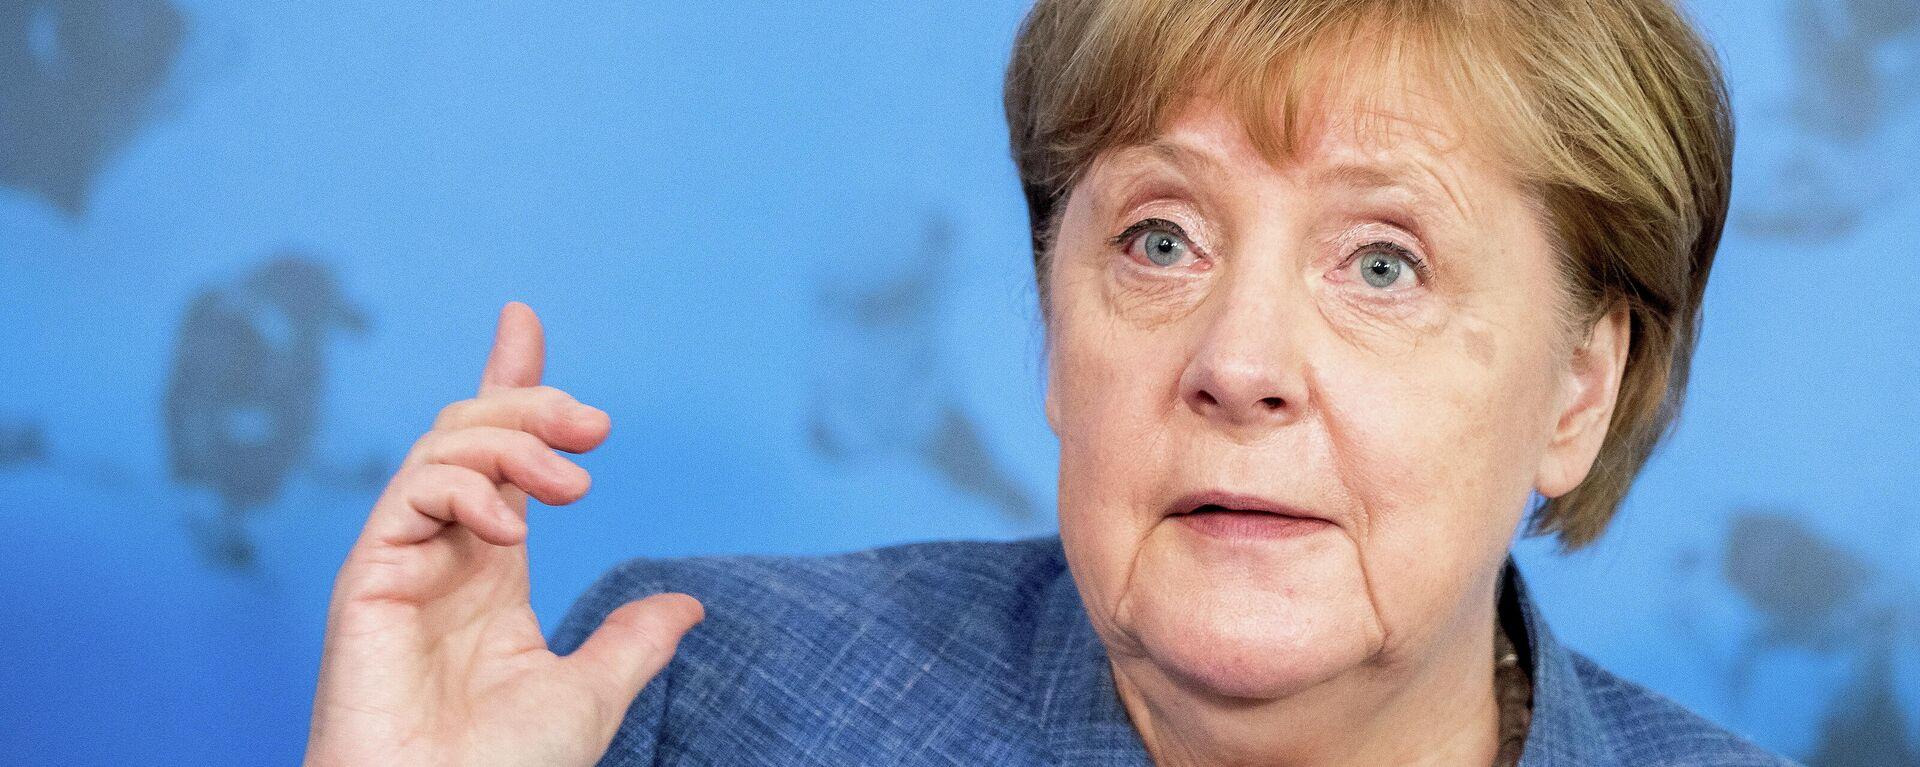 Angela Merkel, canciller alemana - Sputnik Mundo, 1920, 31.08.2021